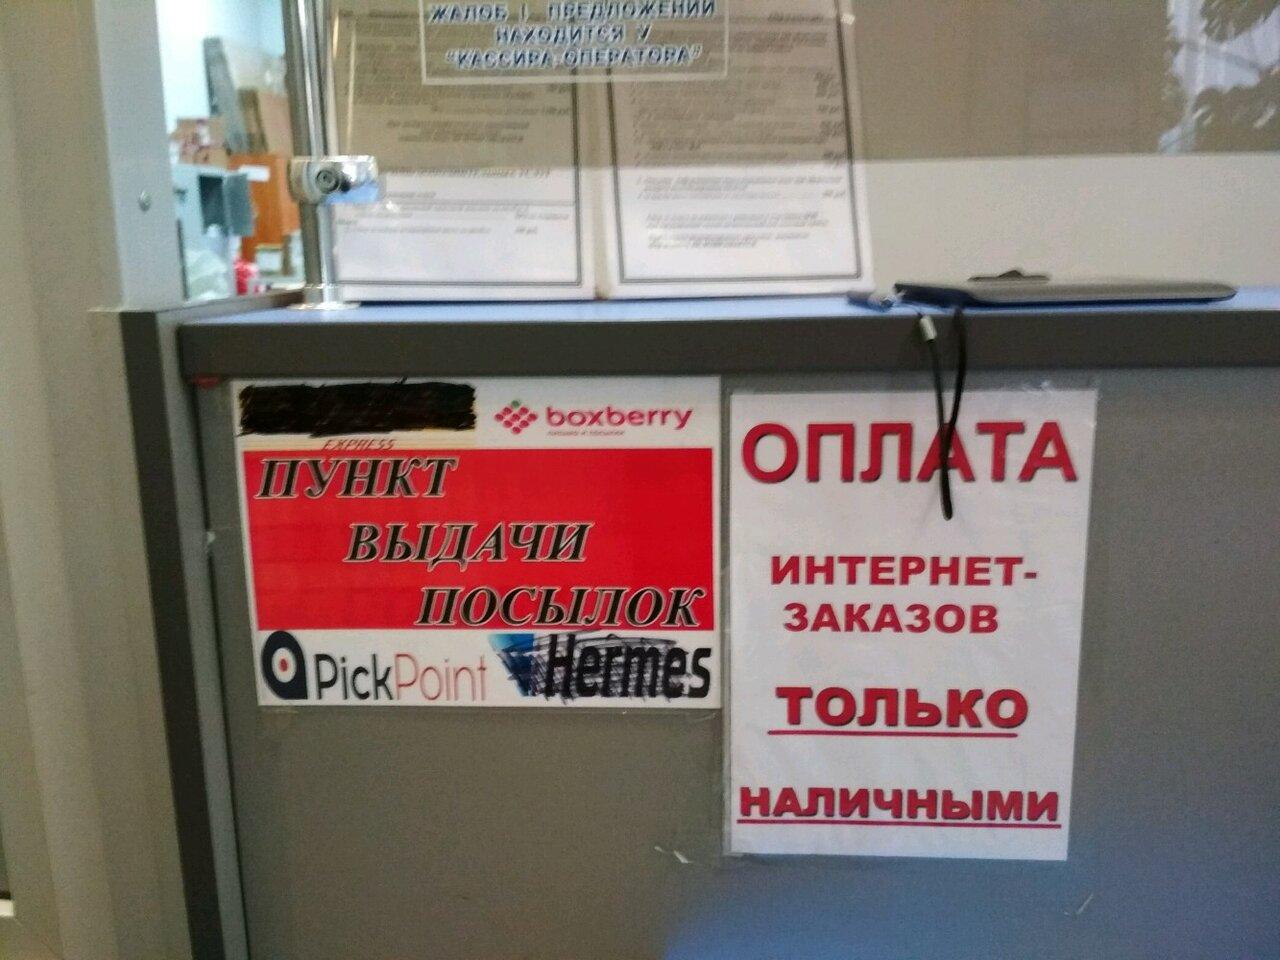 Новочеремушкинская boxberry special business